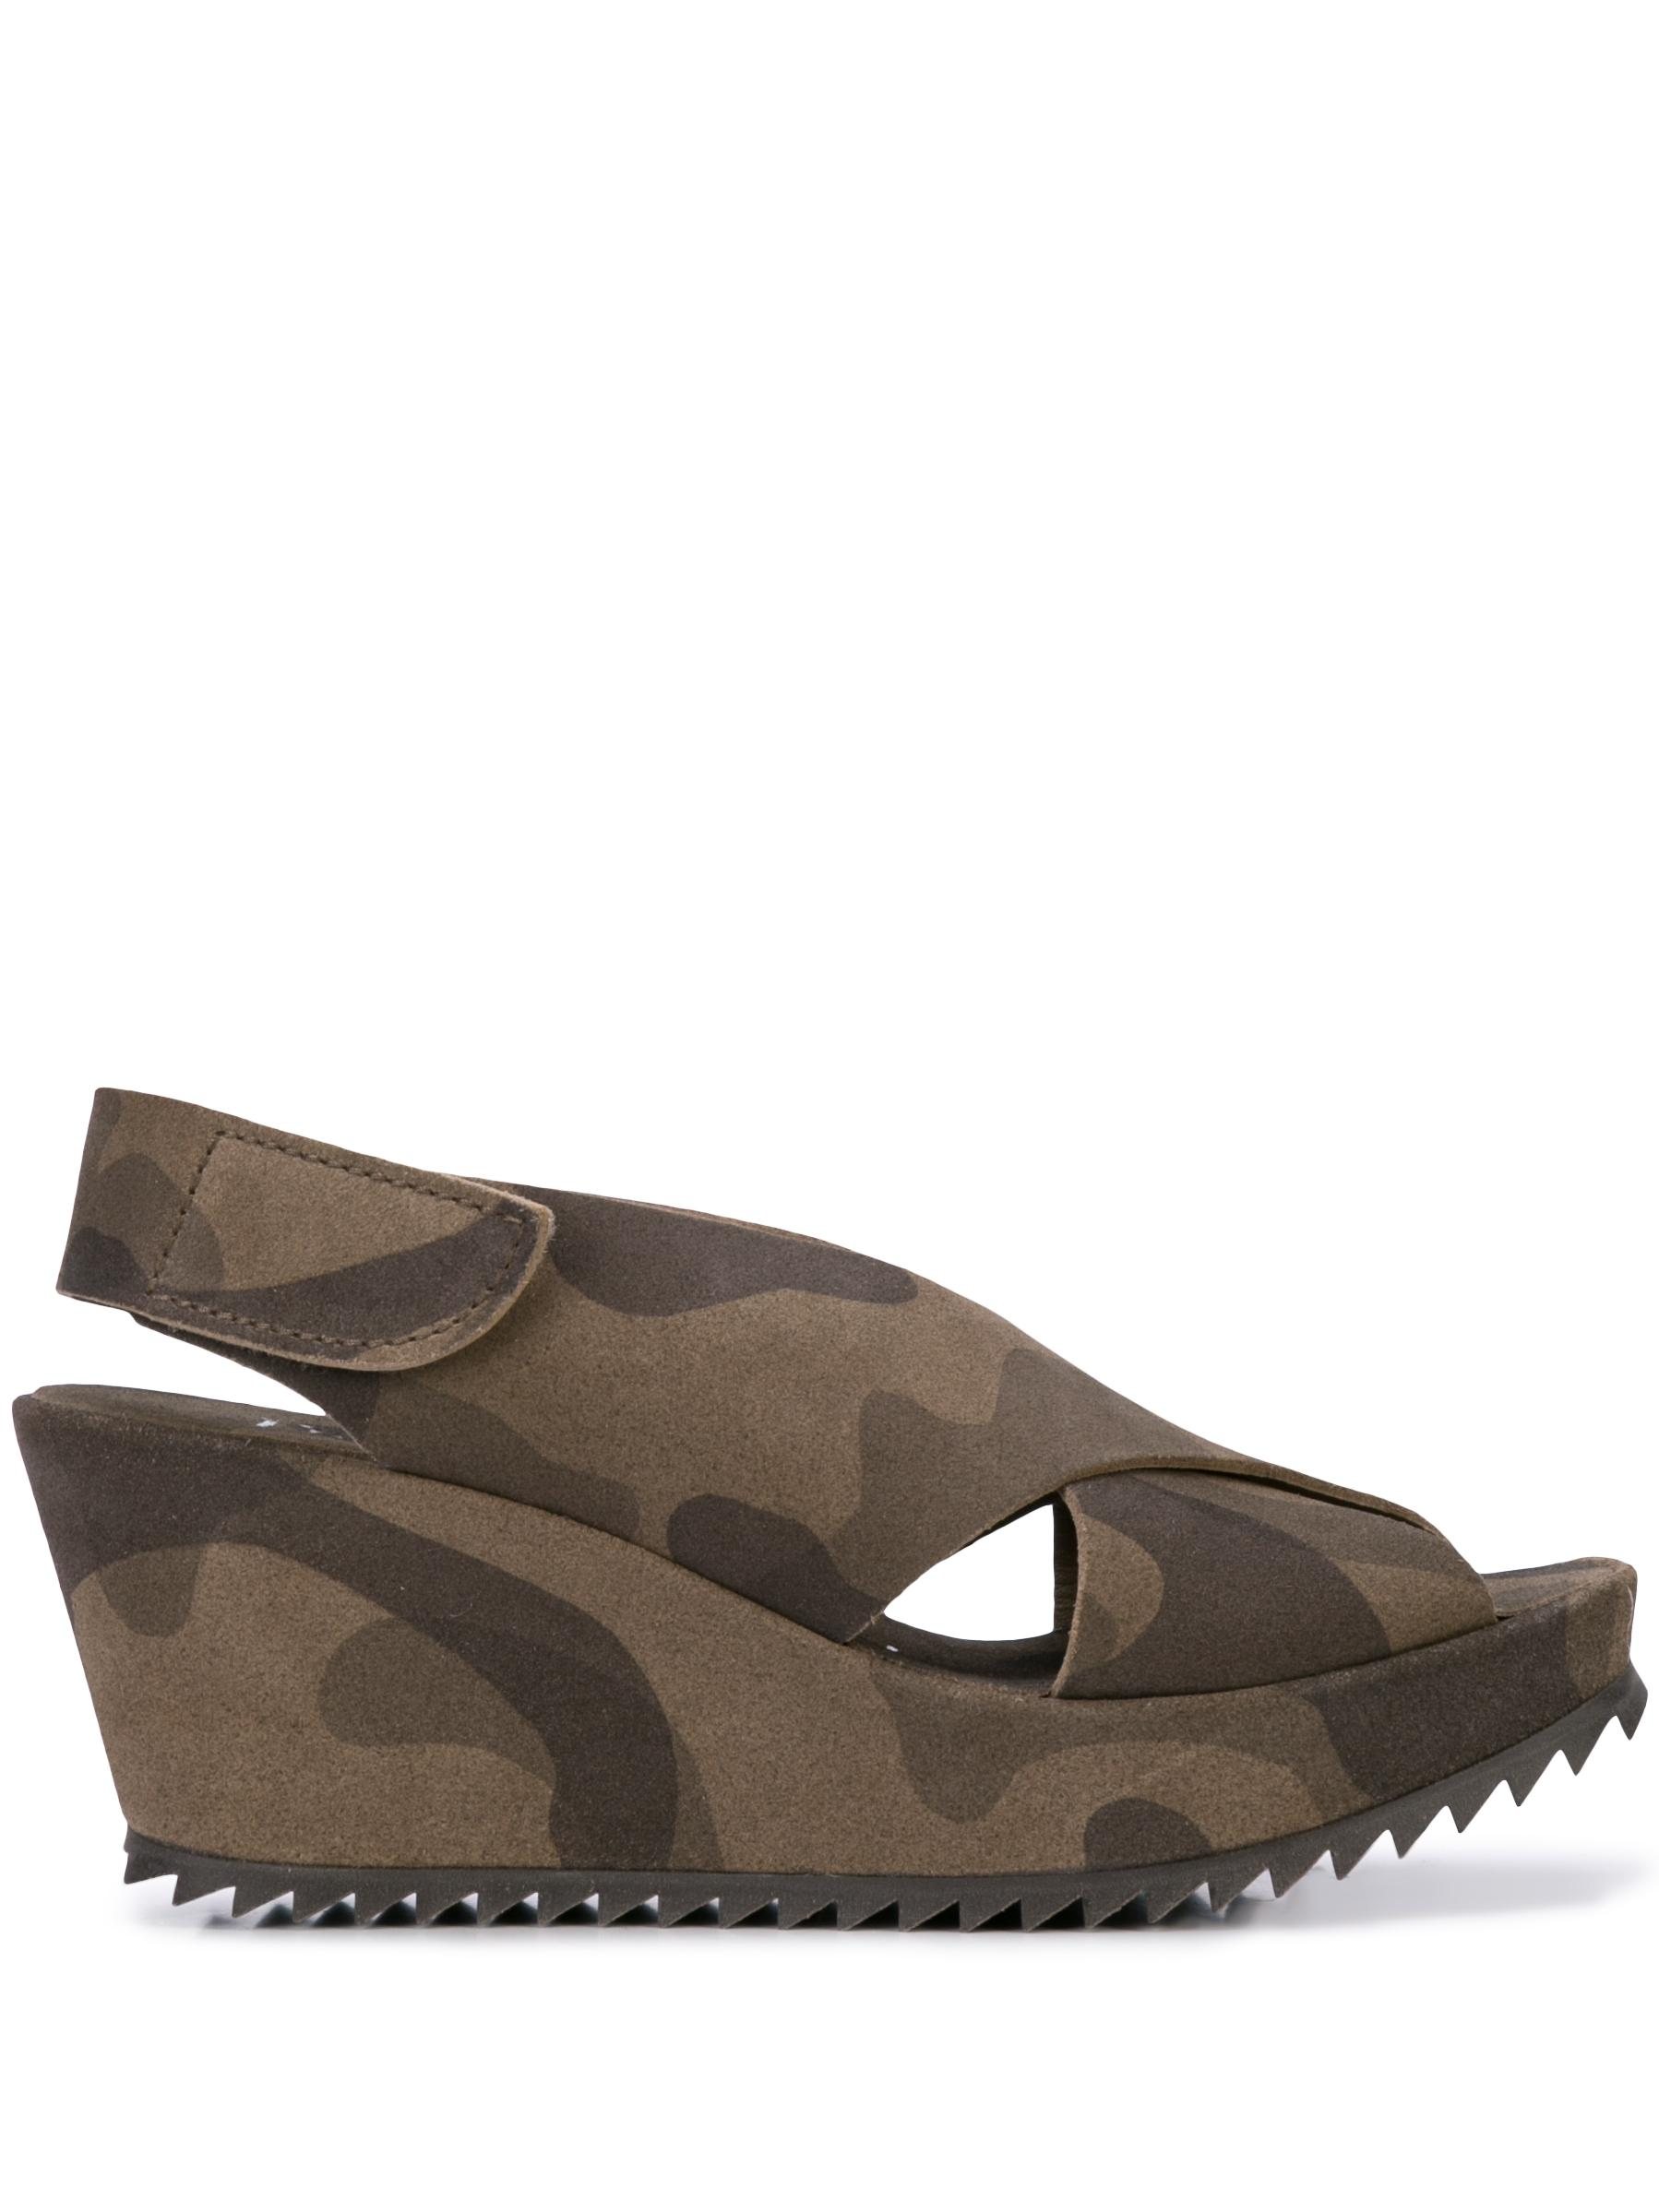 Criss Cross Platform Wedge Sandal With Slingback